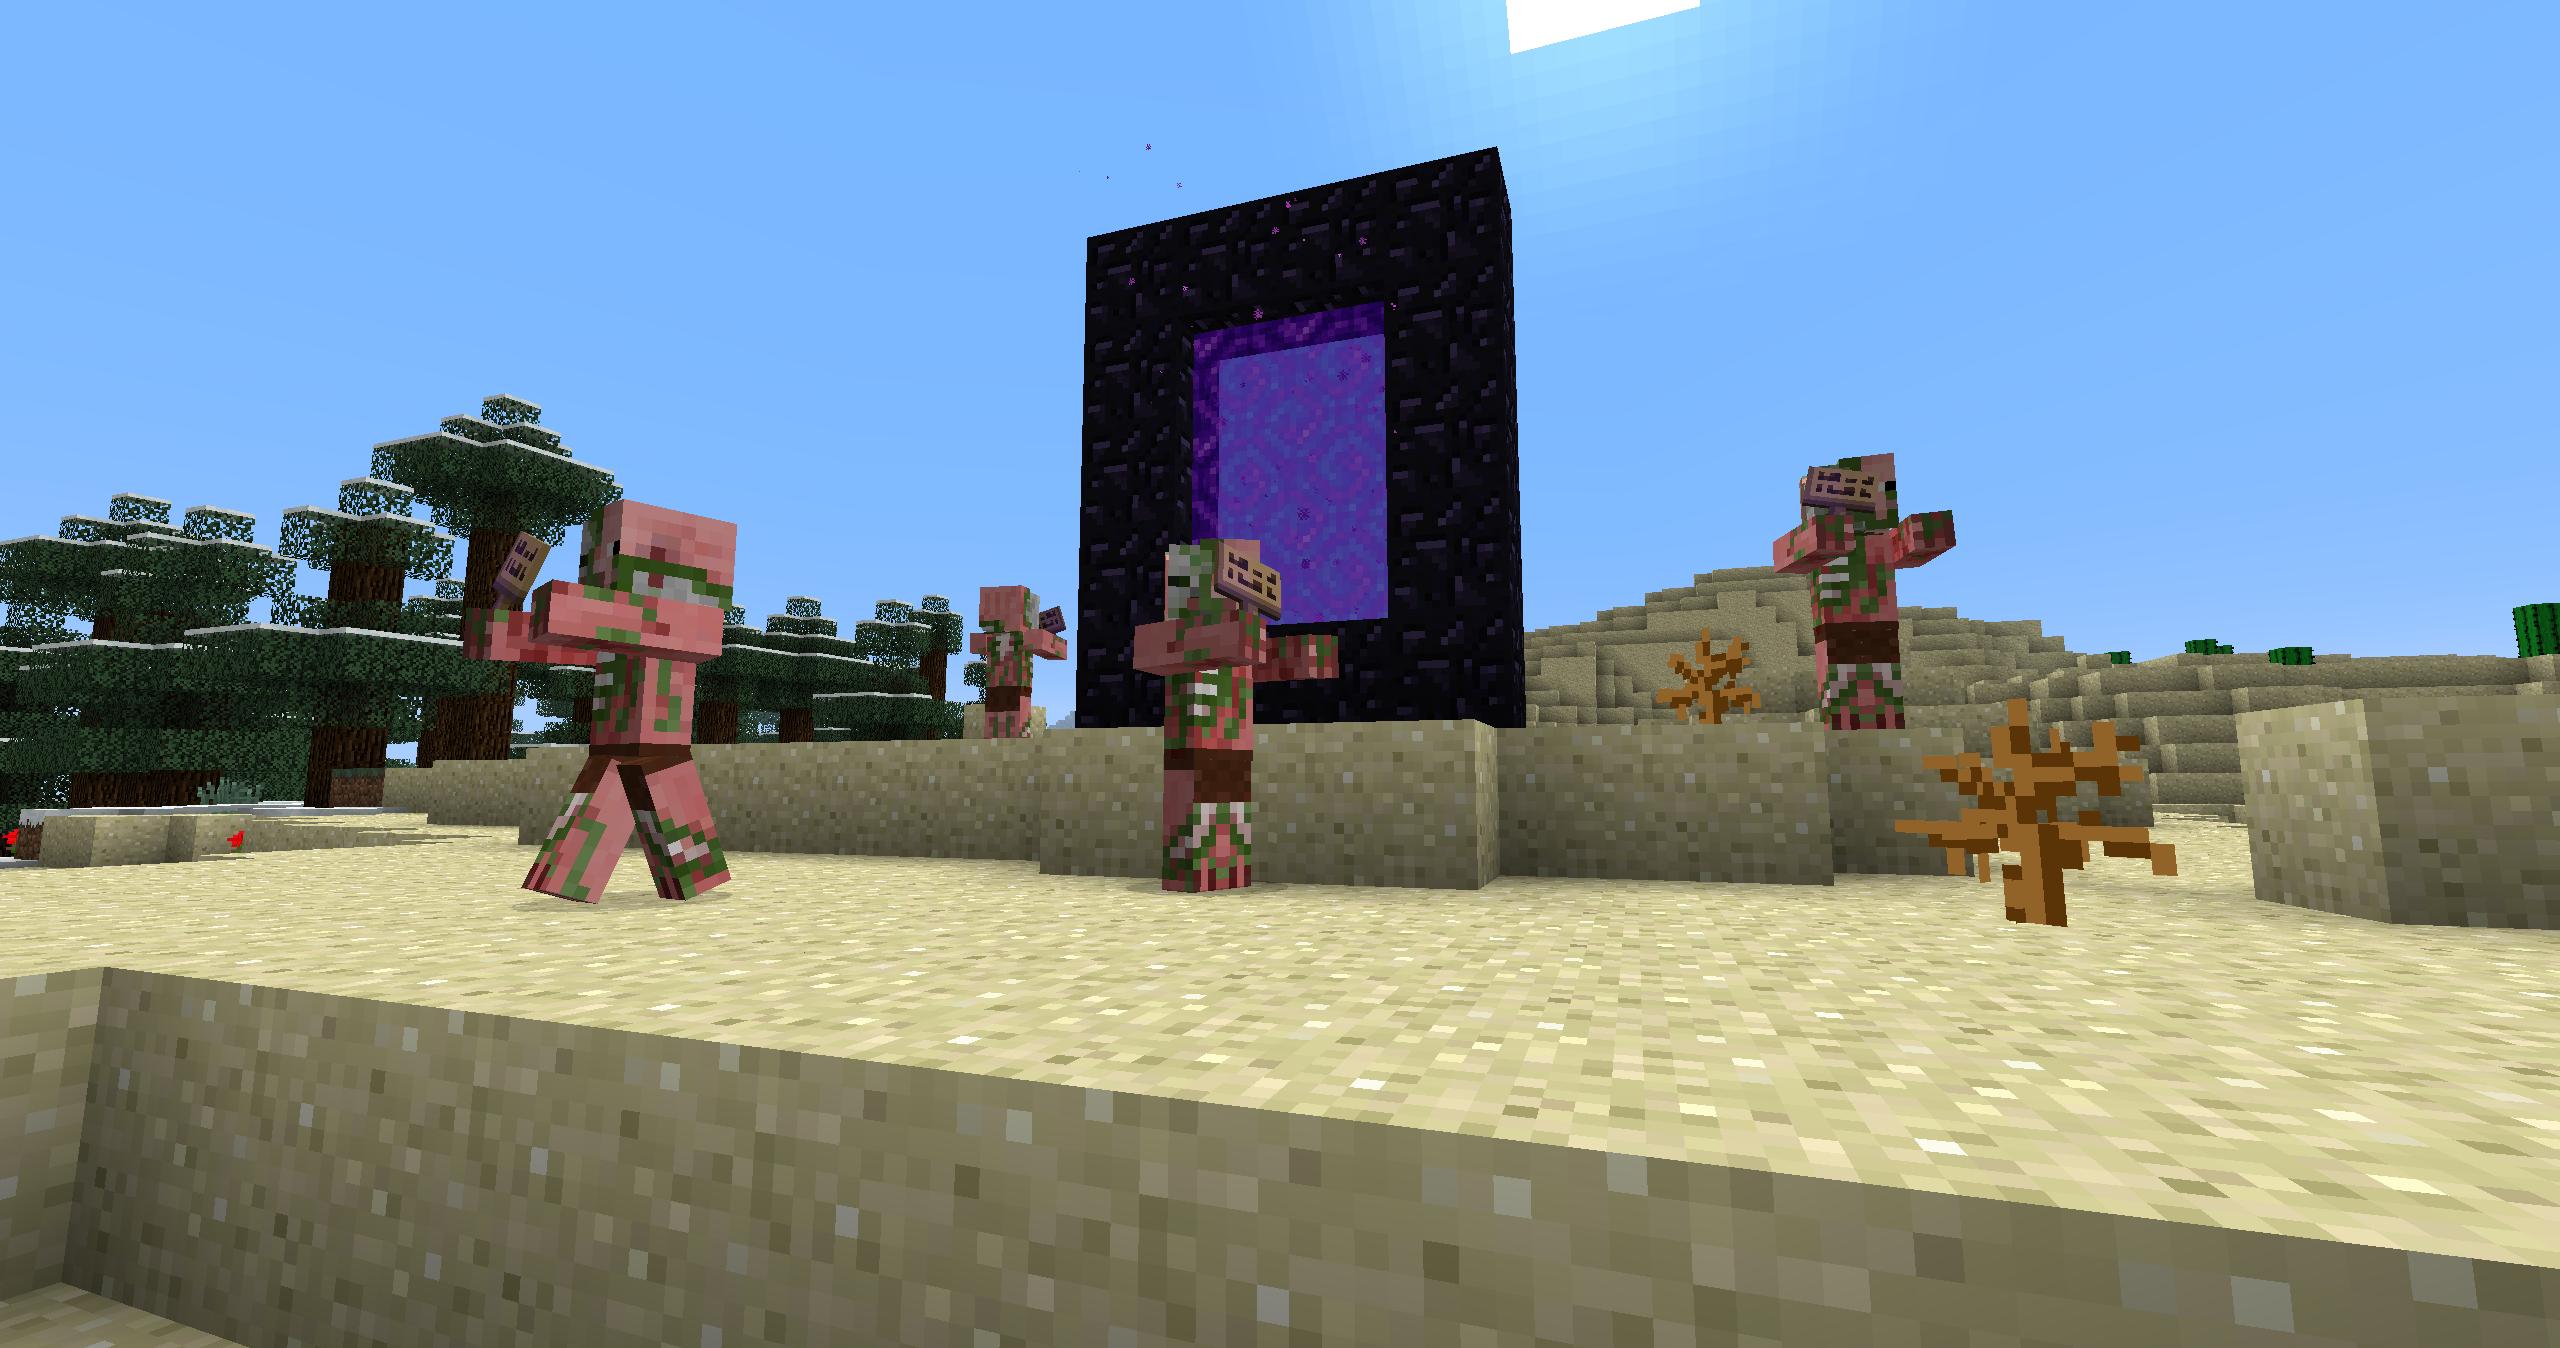 2013 04 04 21.04.33 Minecraft 2.0